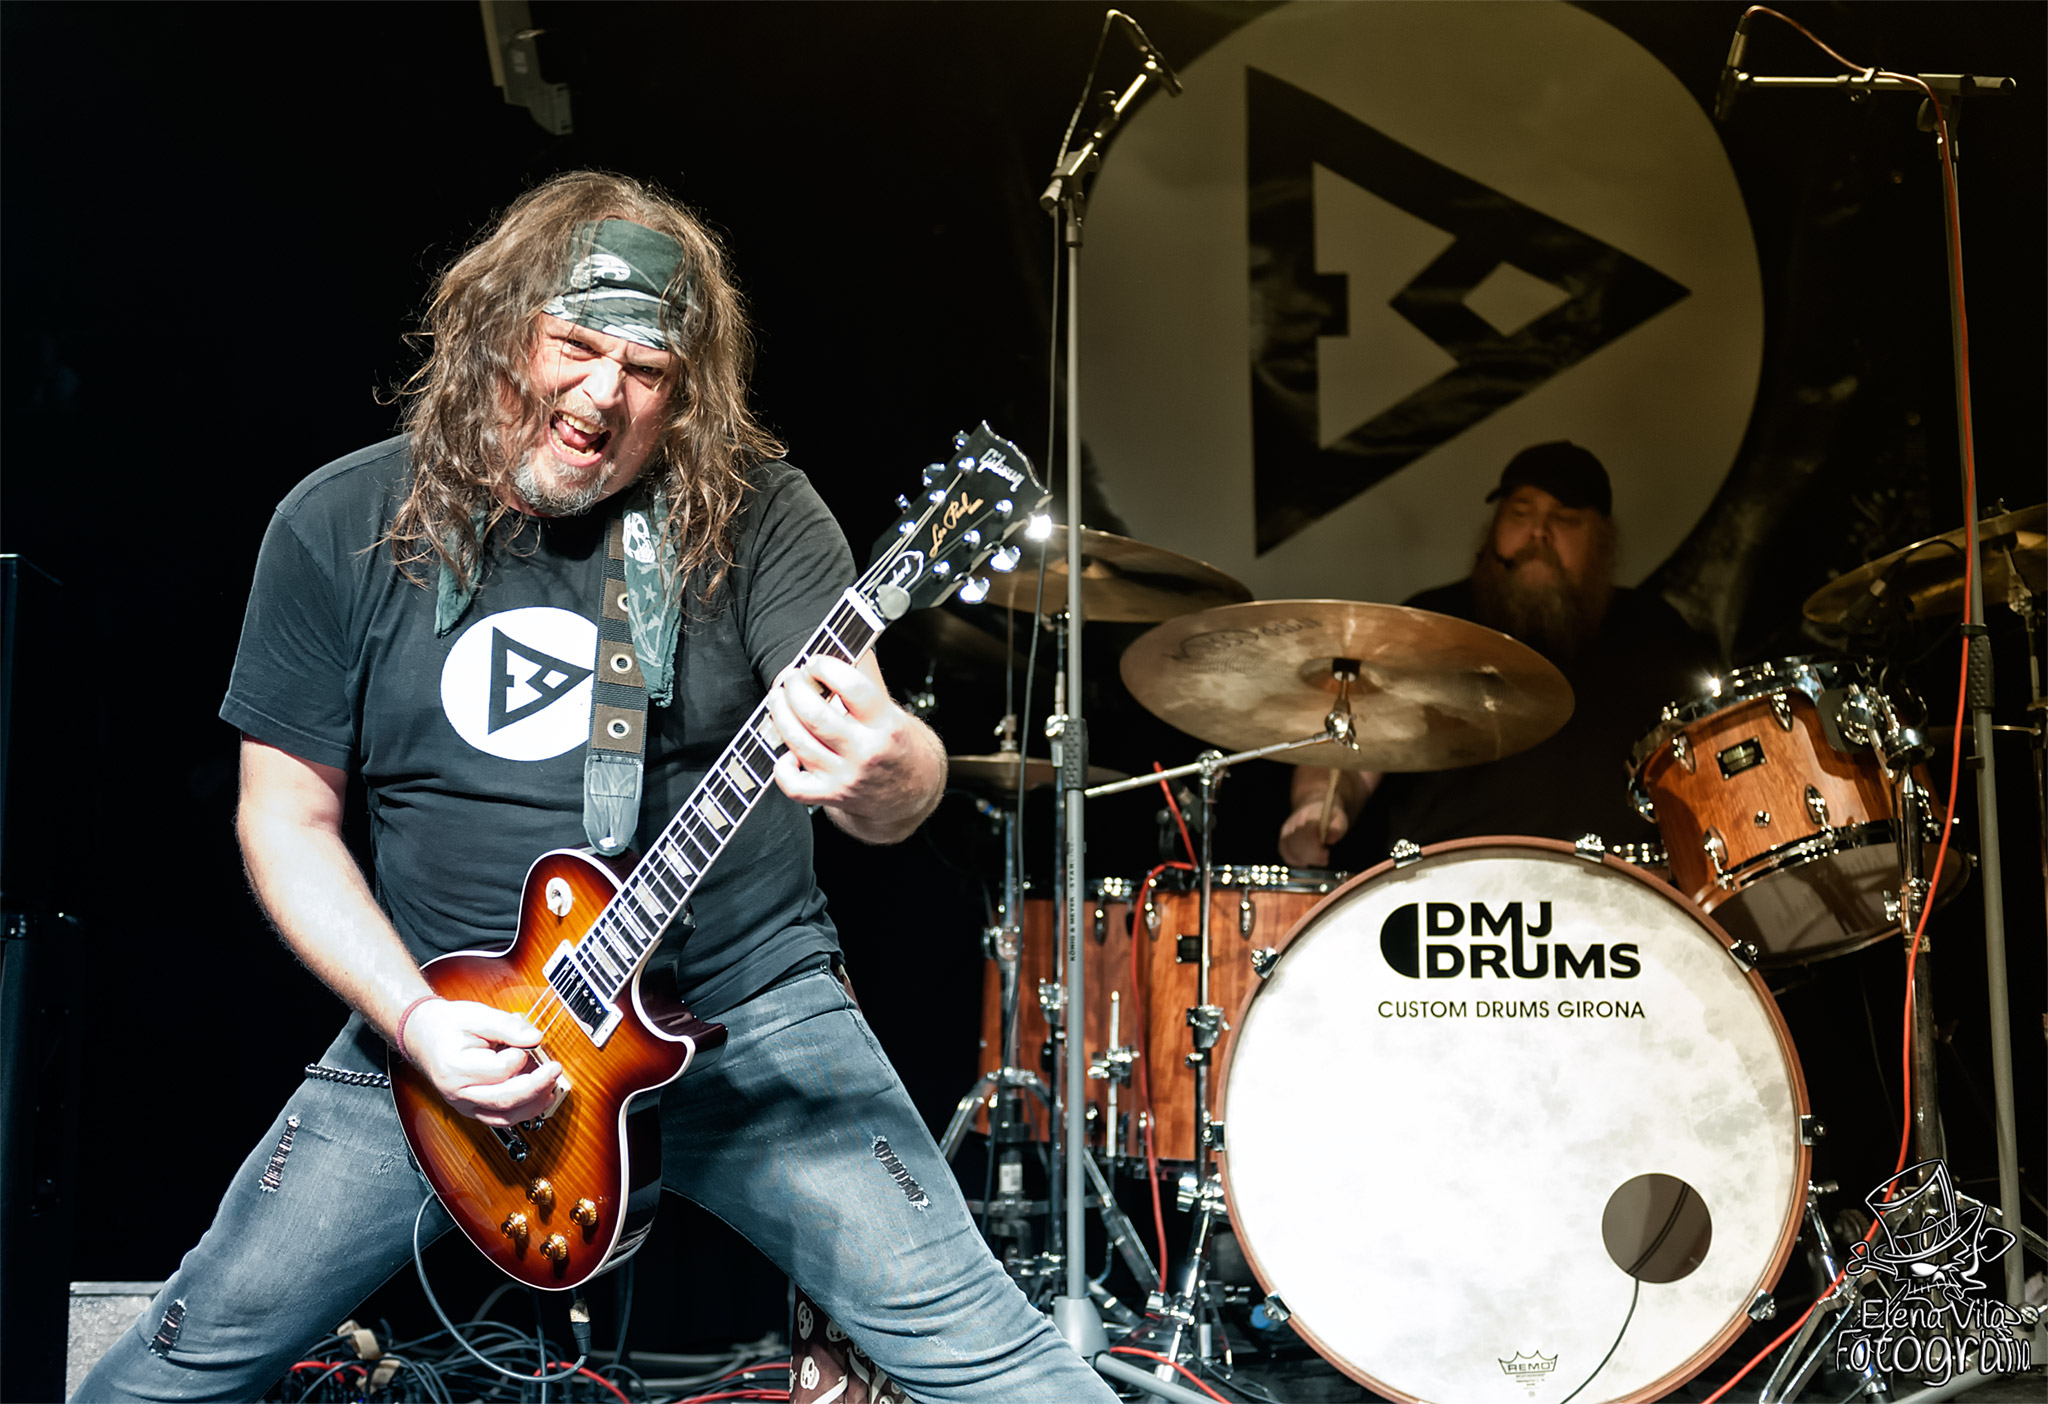 Elisma rock'n'civic 7